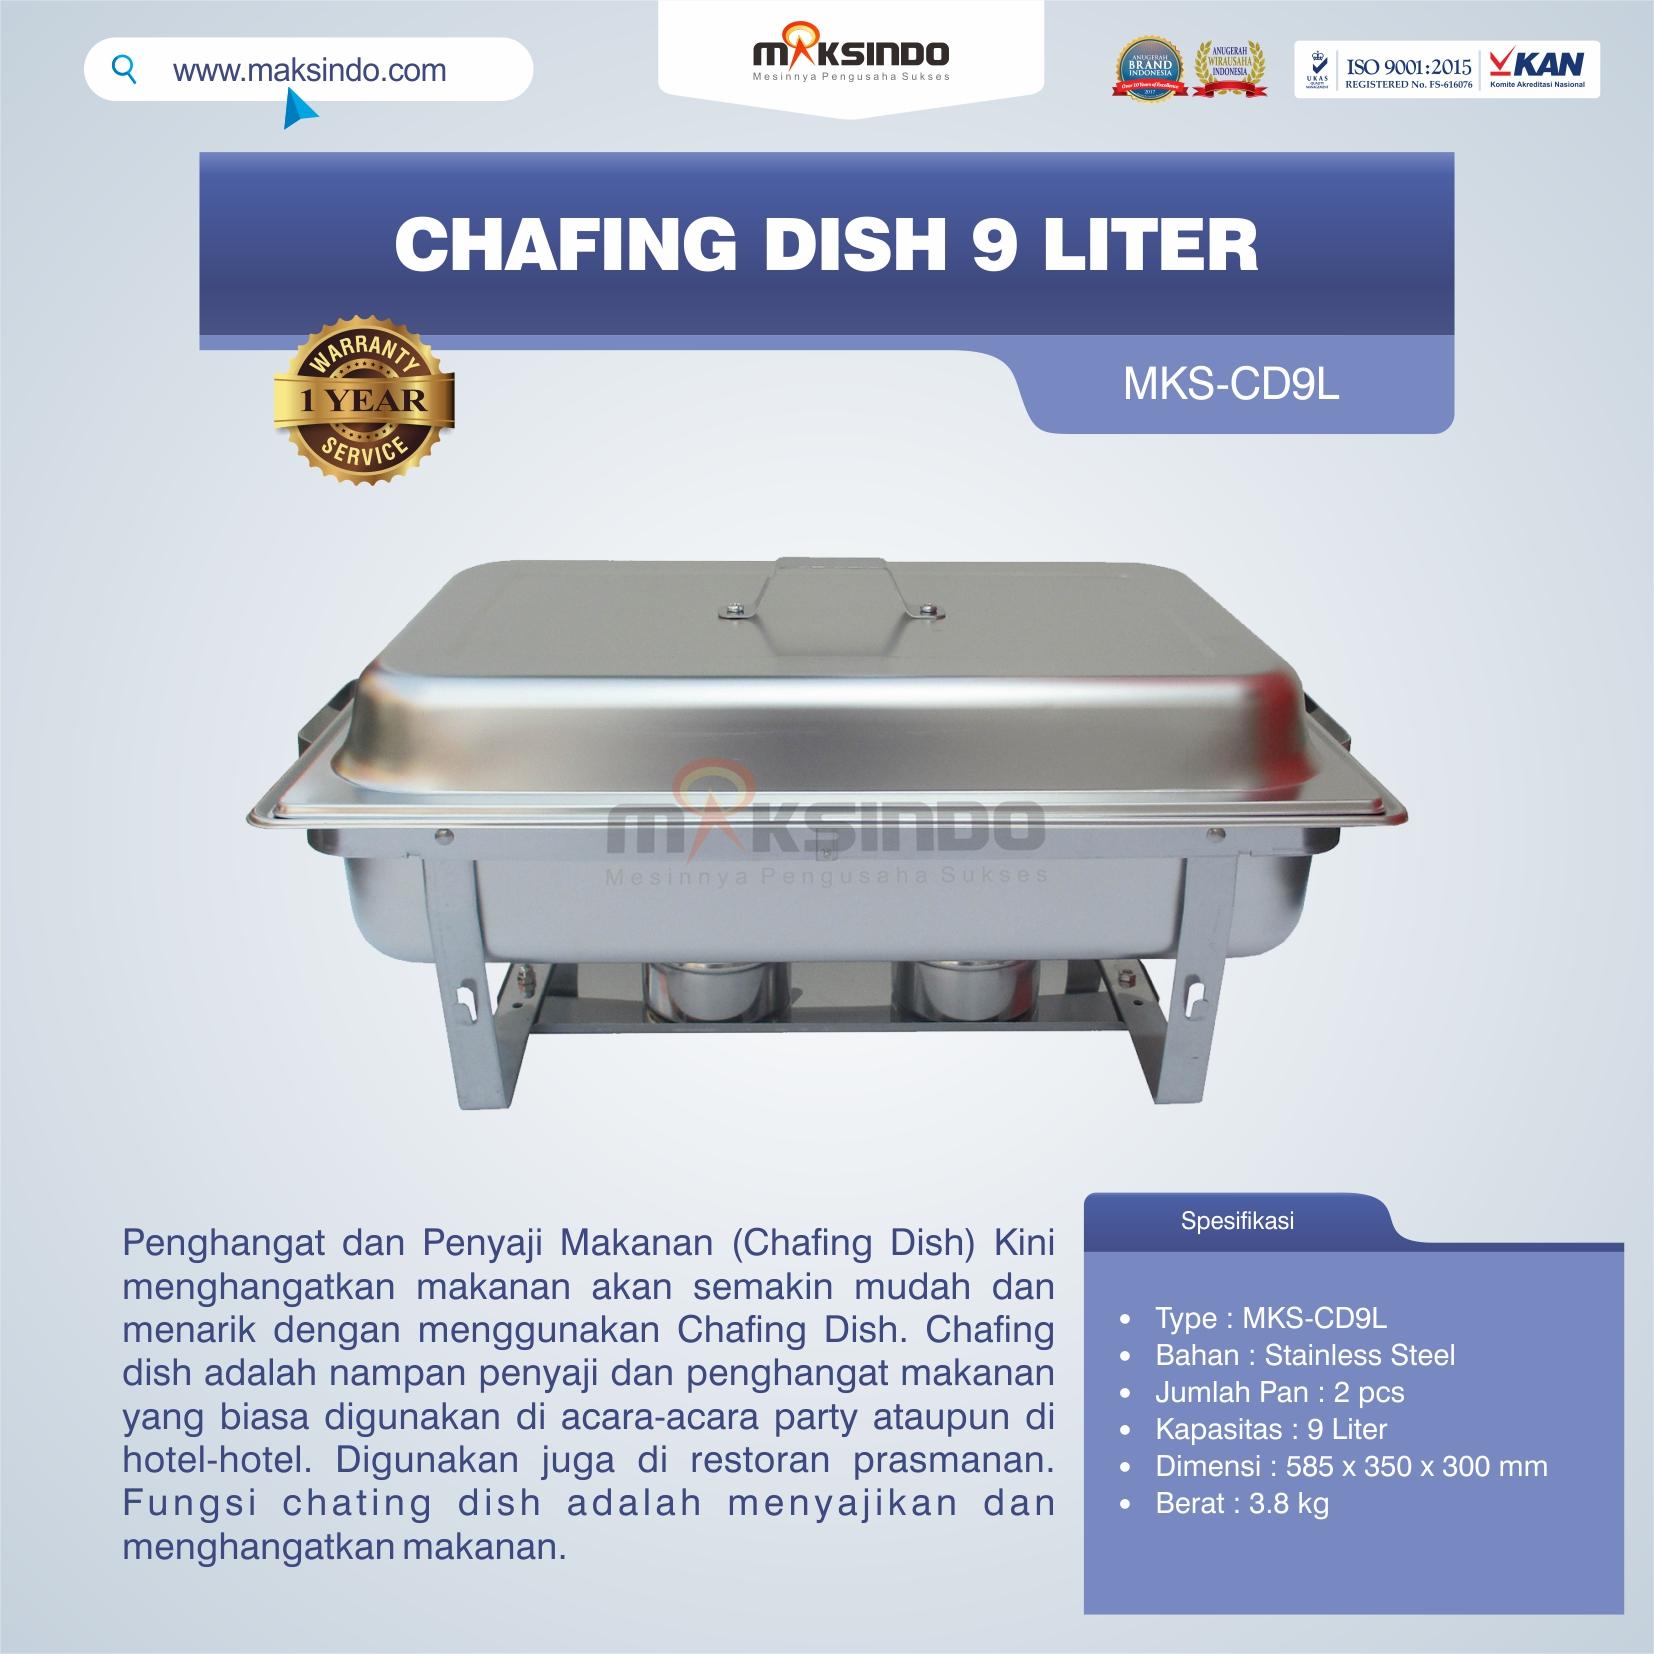 Jual Chafing Dish 9 Liter di Bali